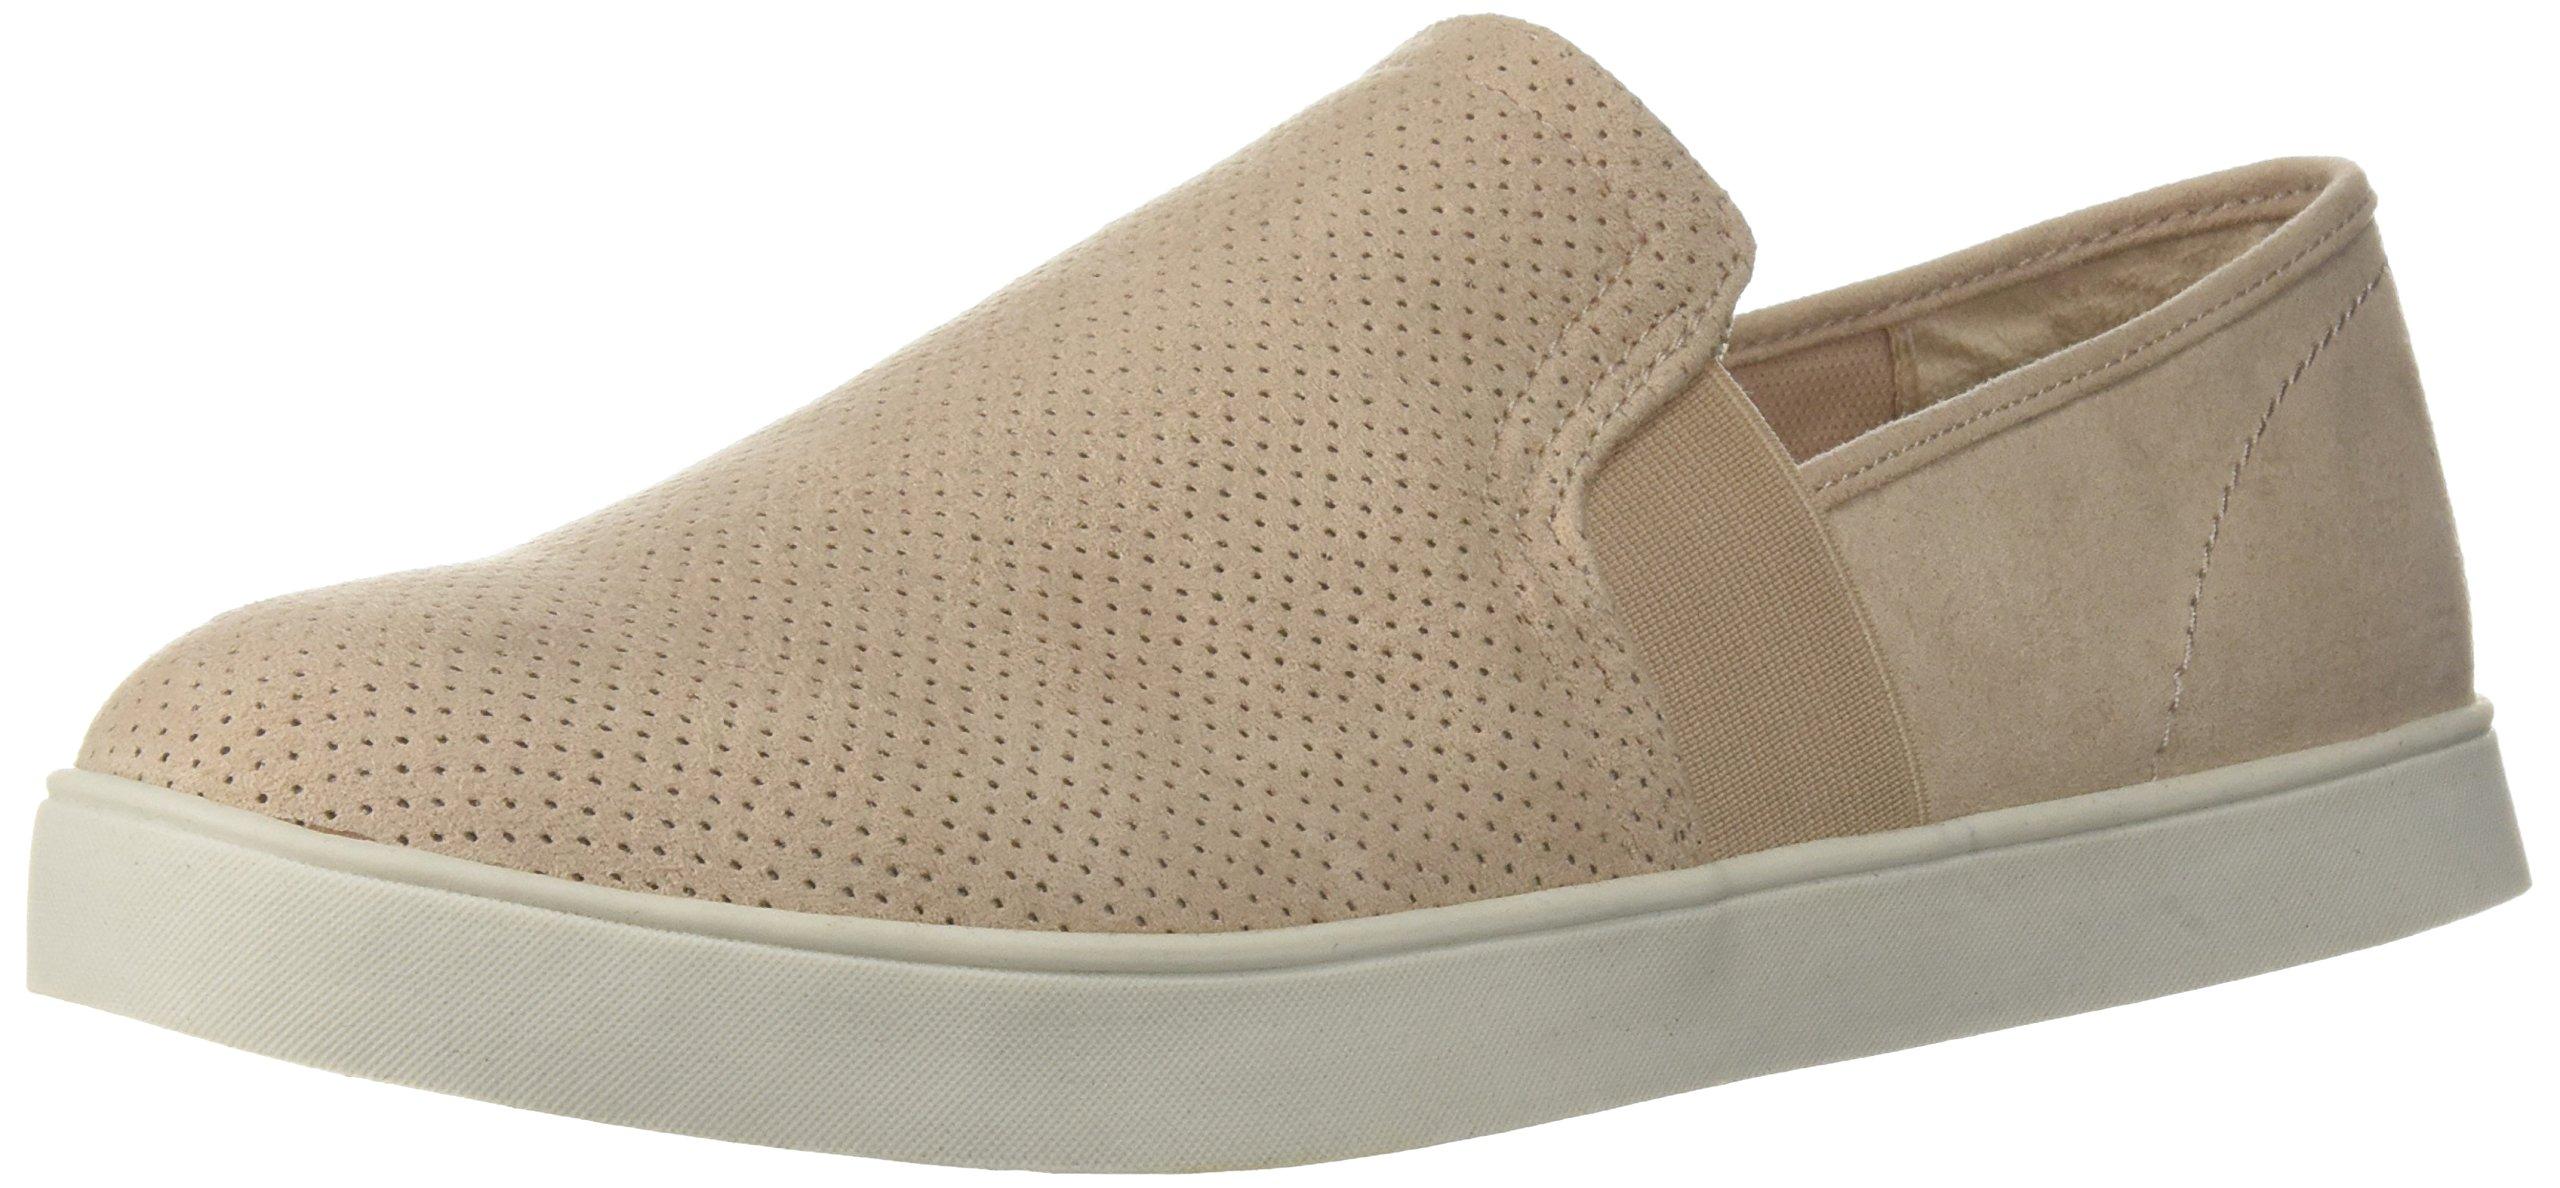 Dr. Scholl's Shoes Women's Luna Sneaker, Blush Microfiber Perforated, 7.5 M US